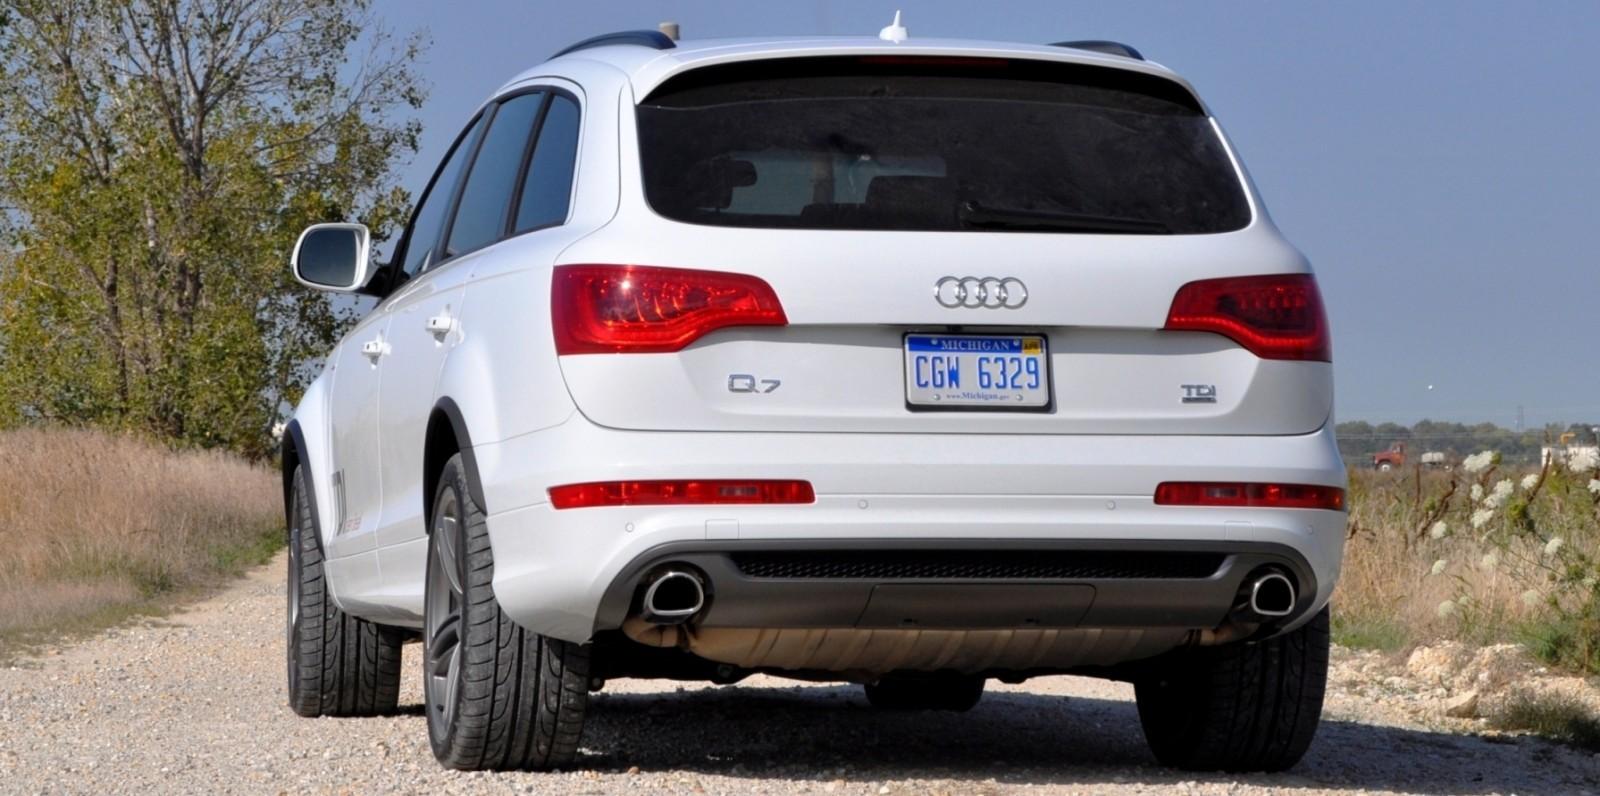 2014 Audi Q7 TDI S-line Plus - Carrara White 25